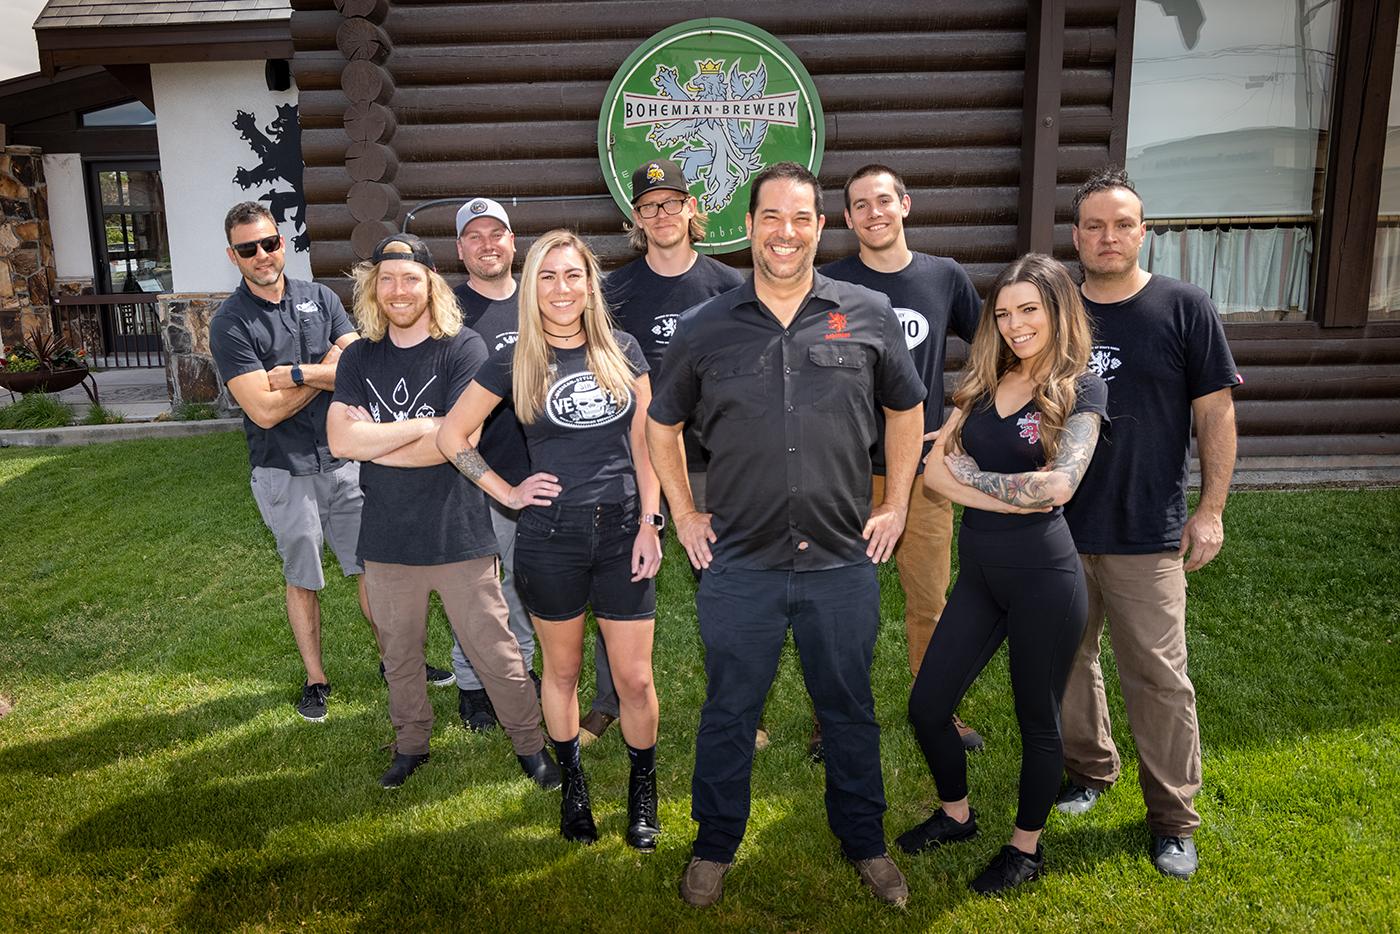 Bohemian Brewery staff Will Gillane, Dylan Harding, Rob Schultz, Janelle Bassett, Brian Ericksen, Kelly Schaefer, Hunter Conley, Taylor Baird and Sasha Taddie.